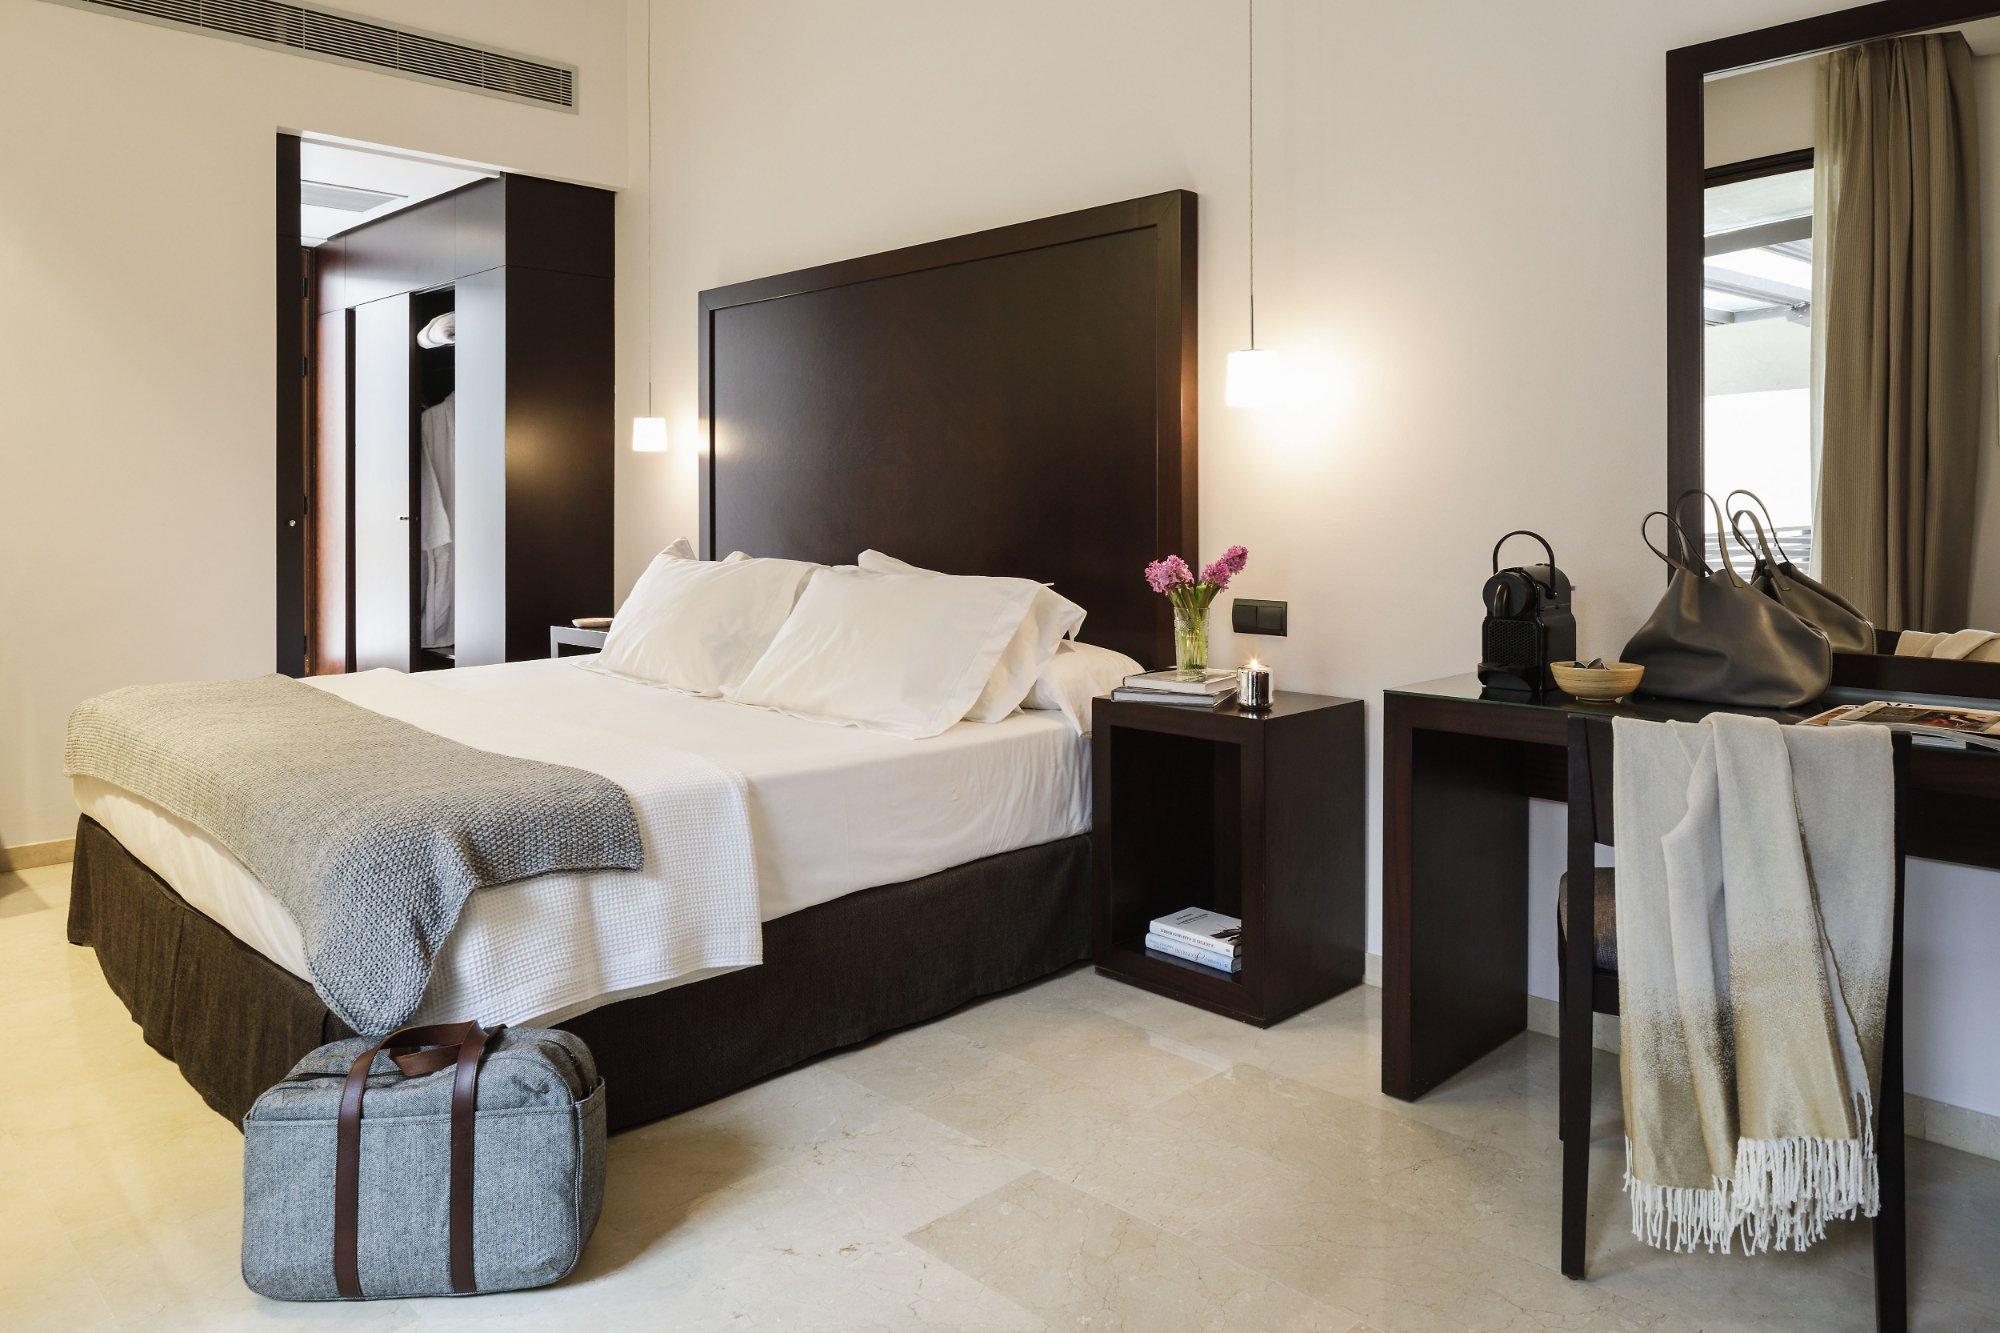 Hotel Posada del Lucero